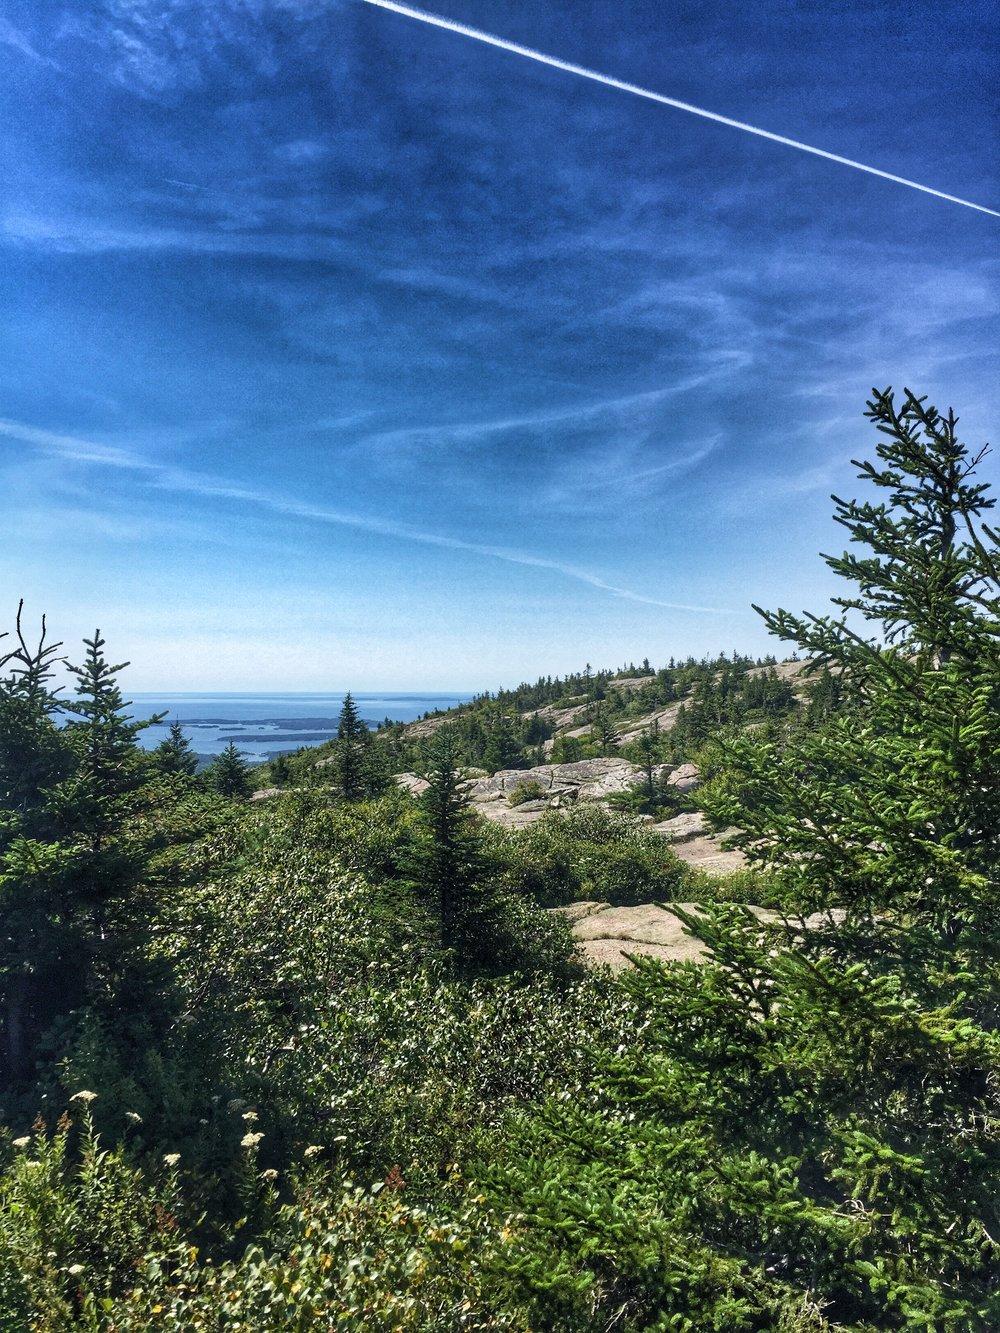 Maine - July 2017